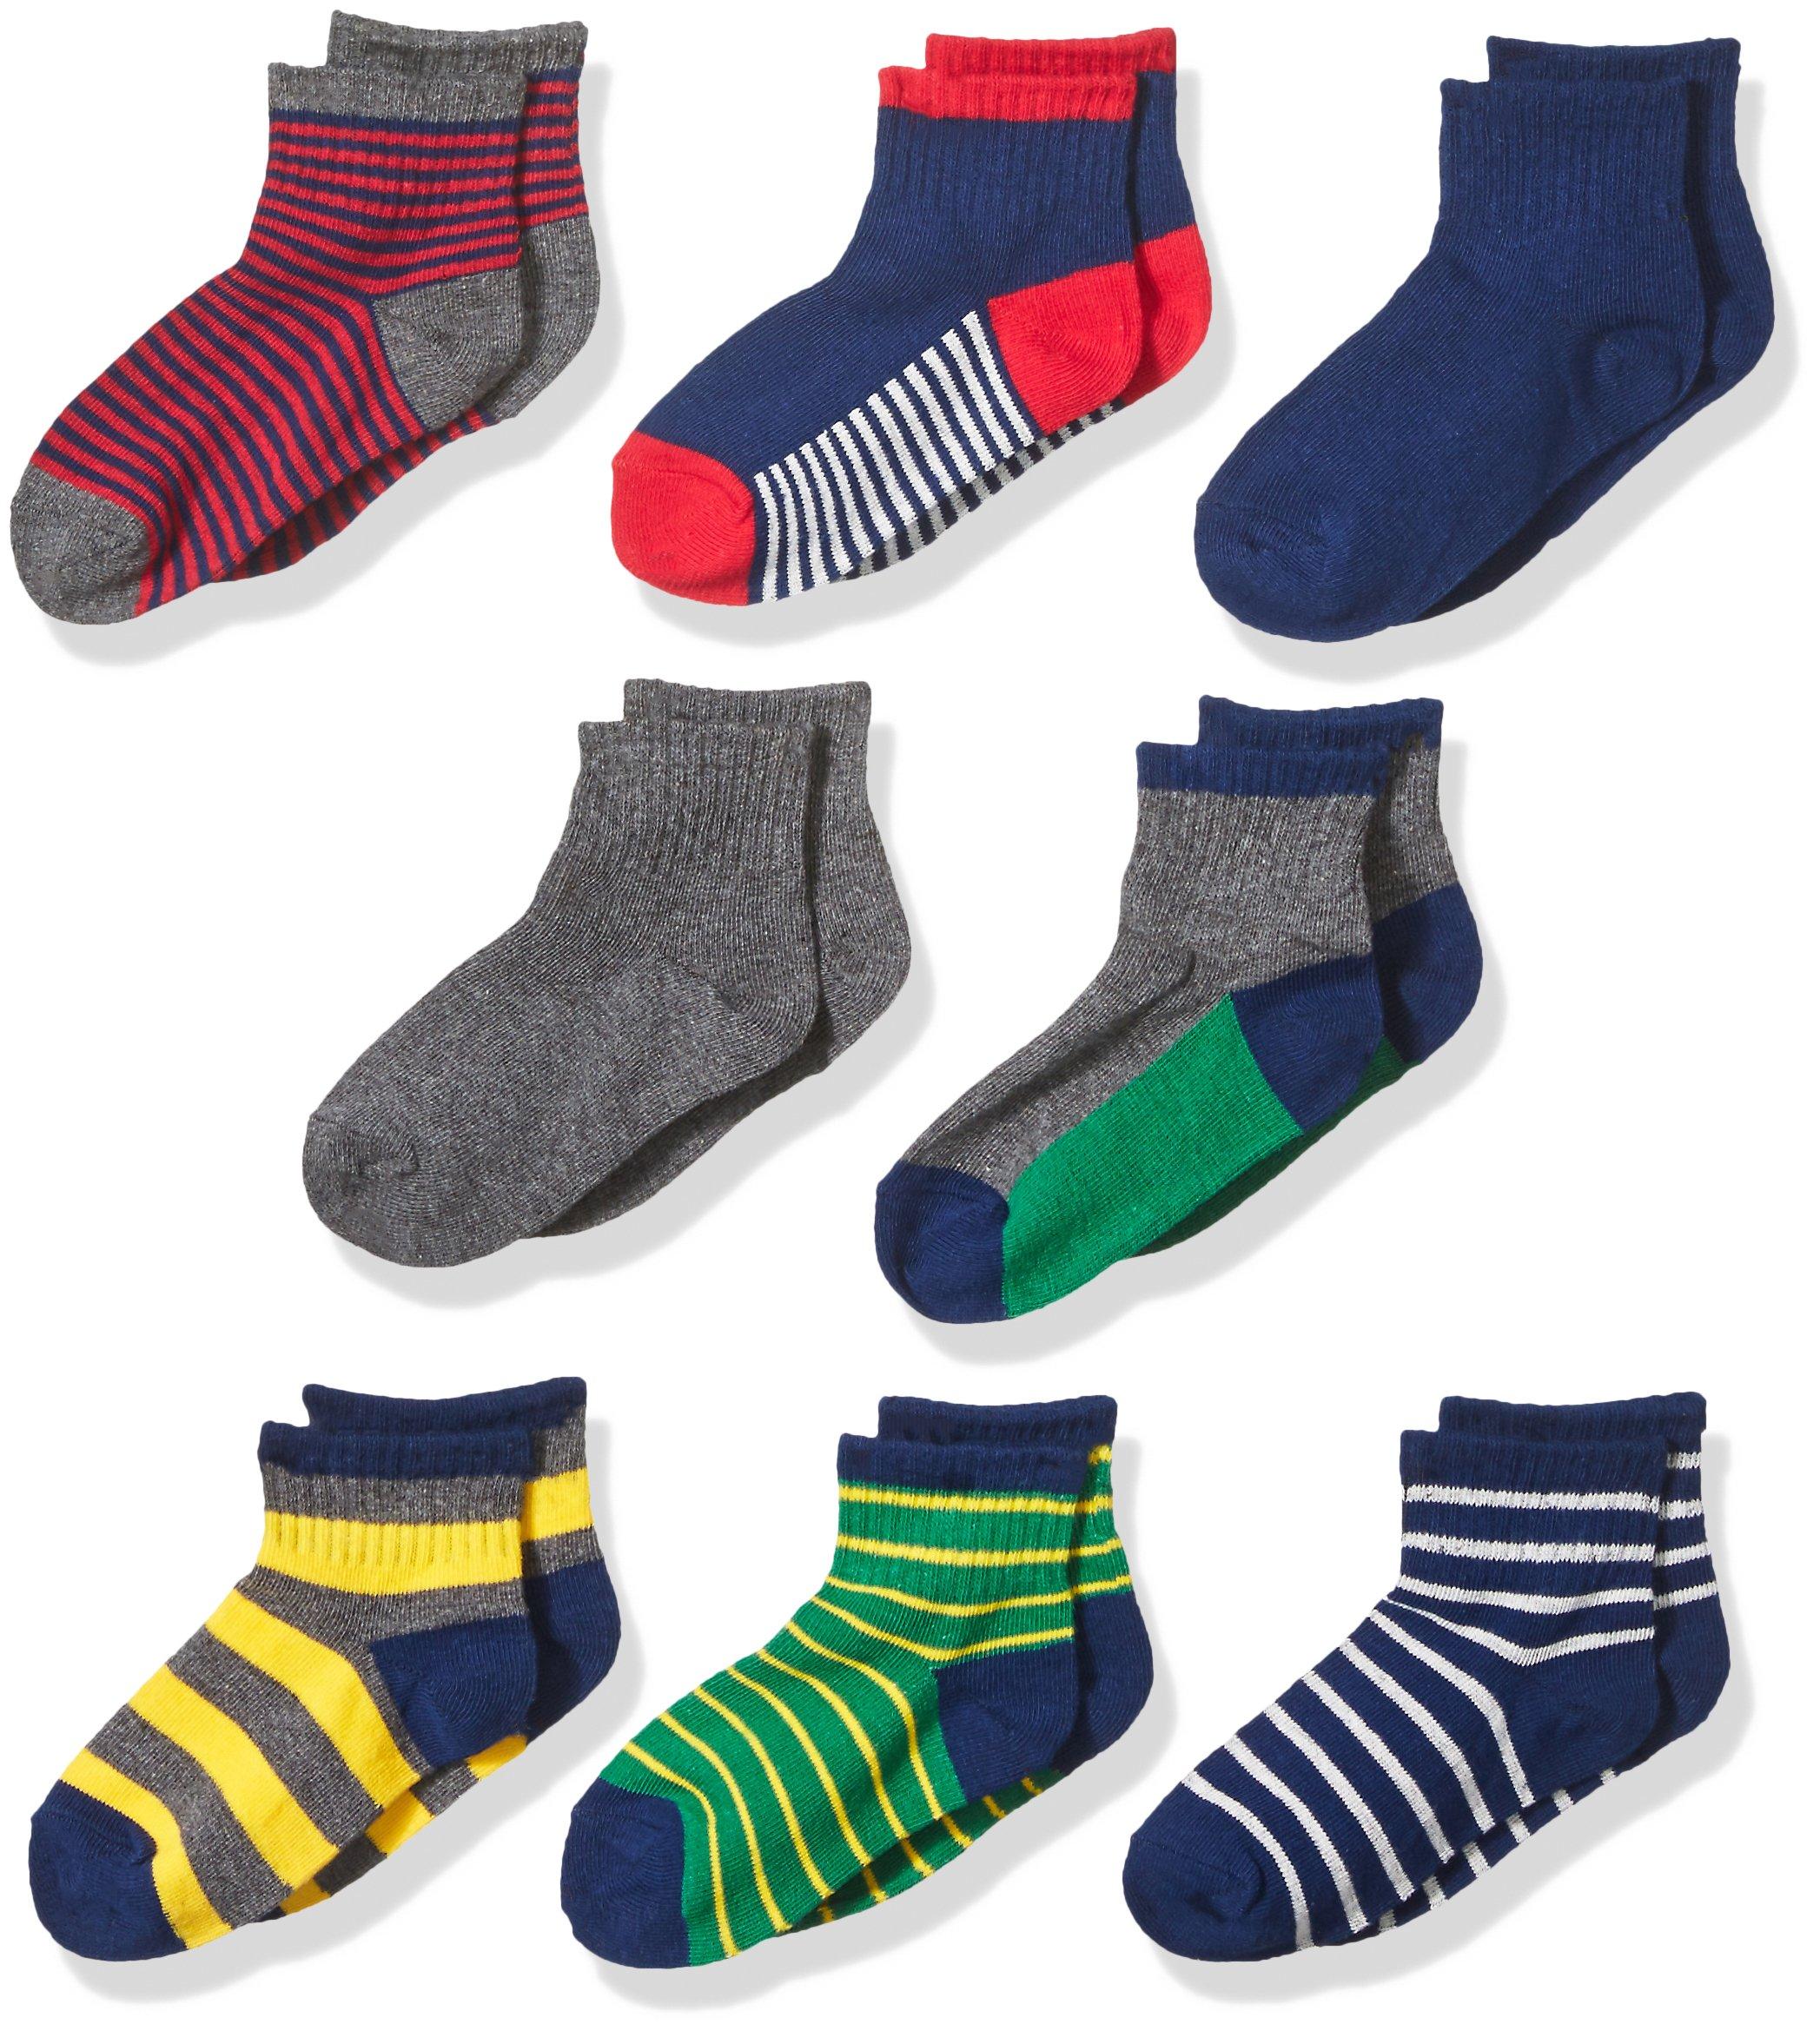 Stride Rite Little Boys' 8-Pack Quarter Socks, Rugby Stripe - Assorted Colors 7-8.5 / Shoe: 10-13